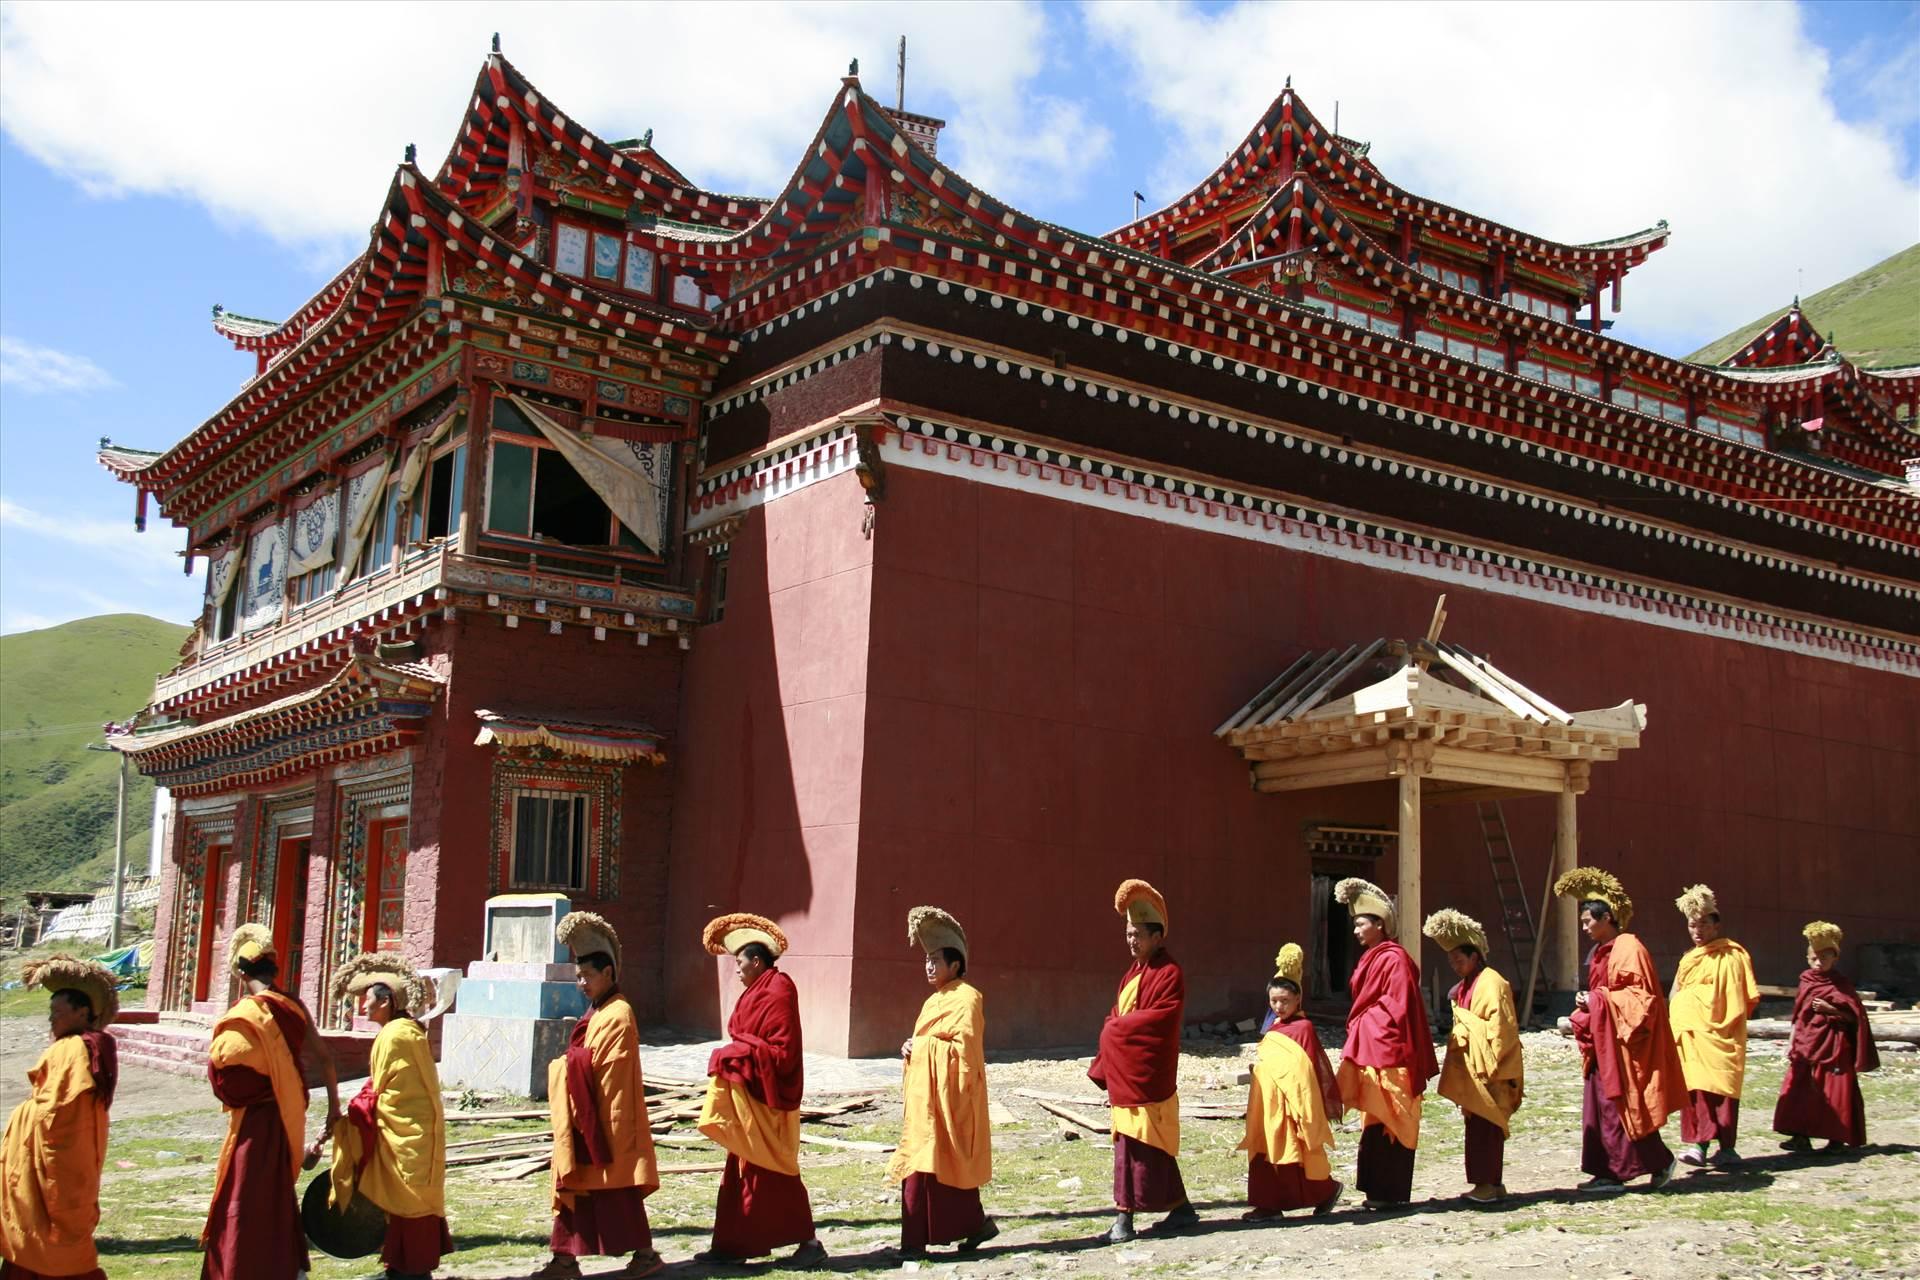 Tibet Festival Tours - Tibet Shambhala Adventure Explore the most authentic Tibetan culture & festivals including the Tibetan New Year, Shoton Festival in Lhasa and Saga Dawa festival in Kailash with Tibet Shambhala Adventure.  https://www.shambhala-adventure.com/package_activity/festival-tour/ by tibetshambhalaadventure